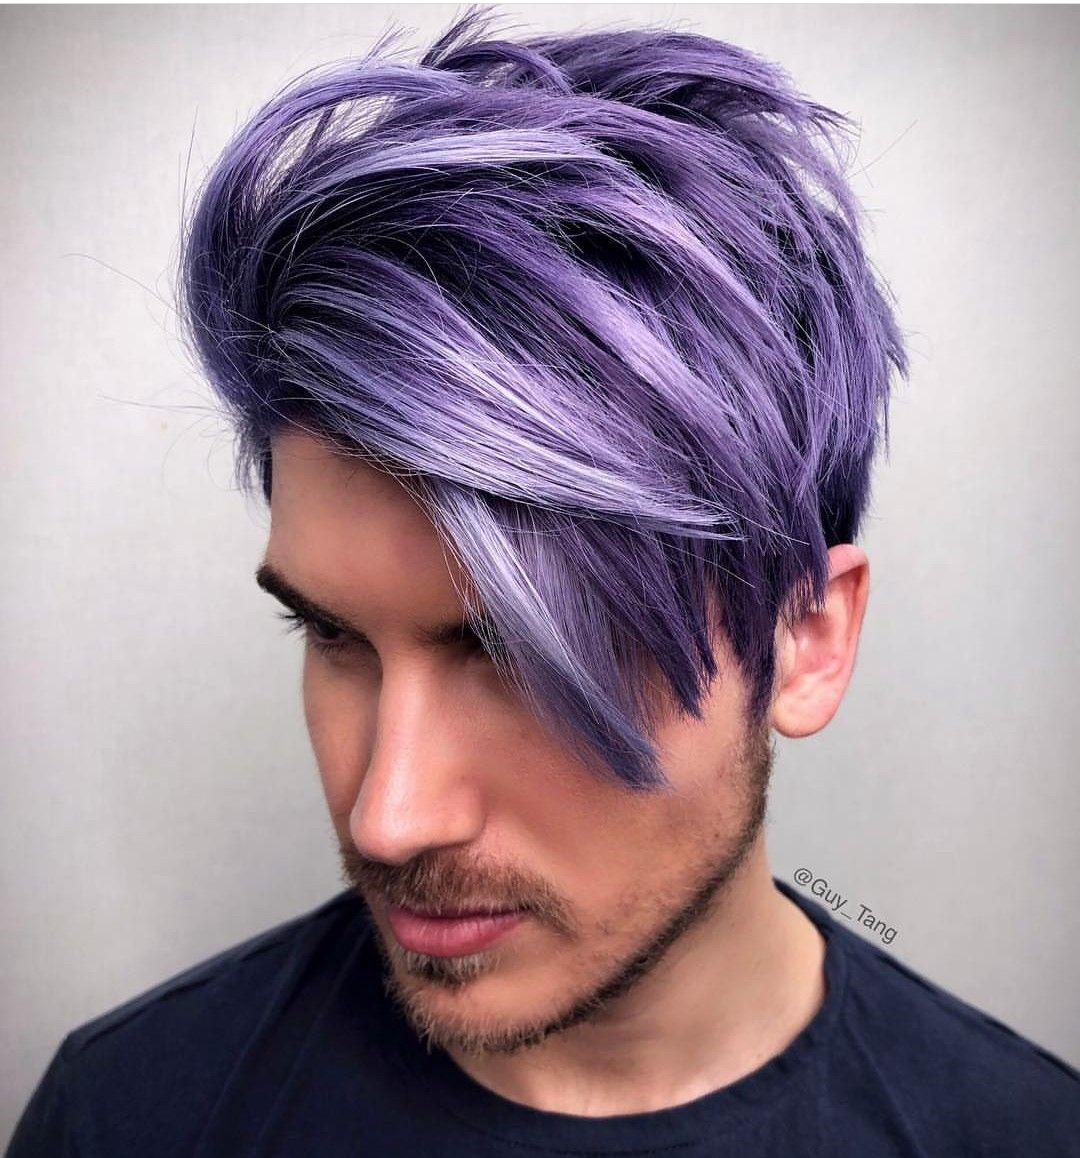 Pin By Christina Watt On Guy Tang Hair God Creations Men Hair Color Dyed Hair Men Hair And Beard Styles